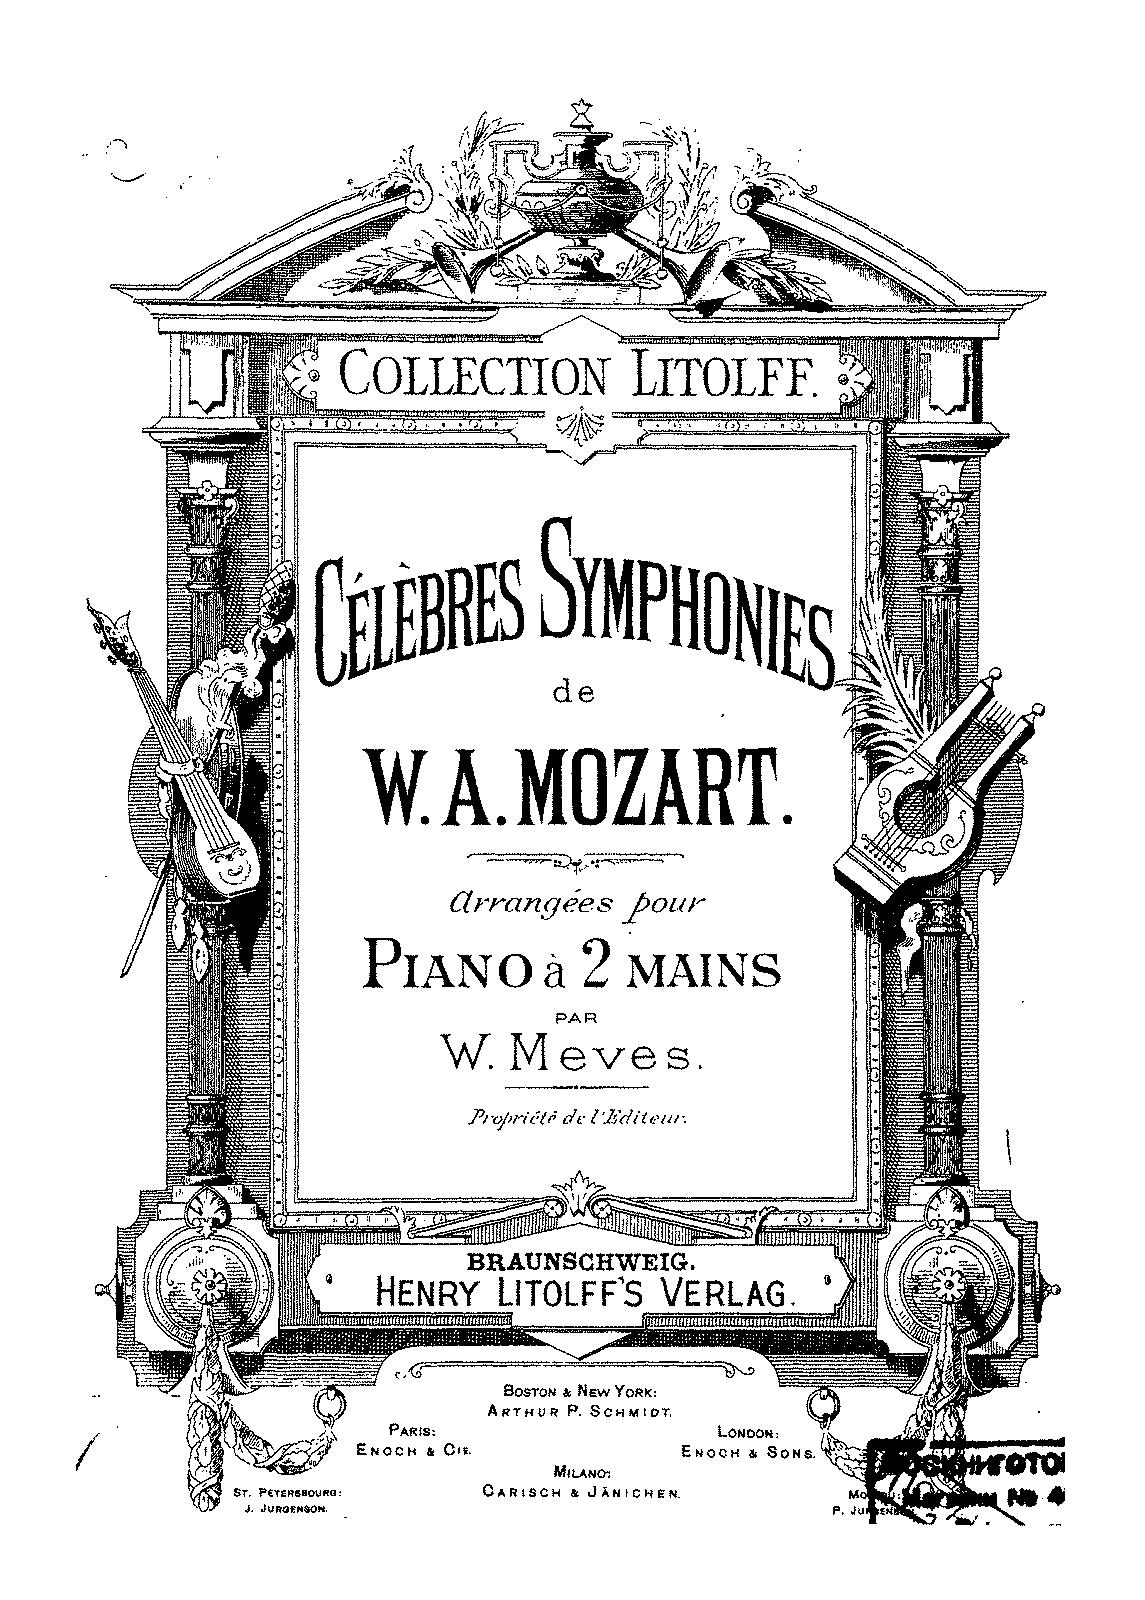 Symphony No.40 in G minor, K.550 (Mozart, Wolfgang Amadeus